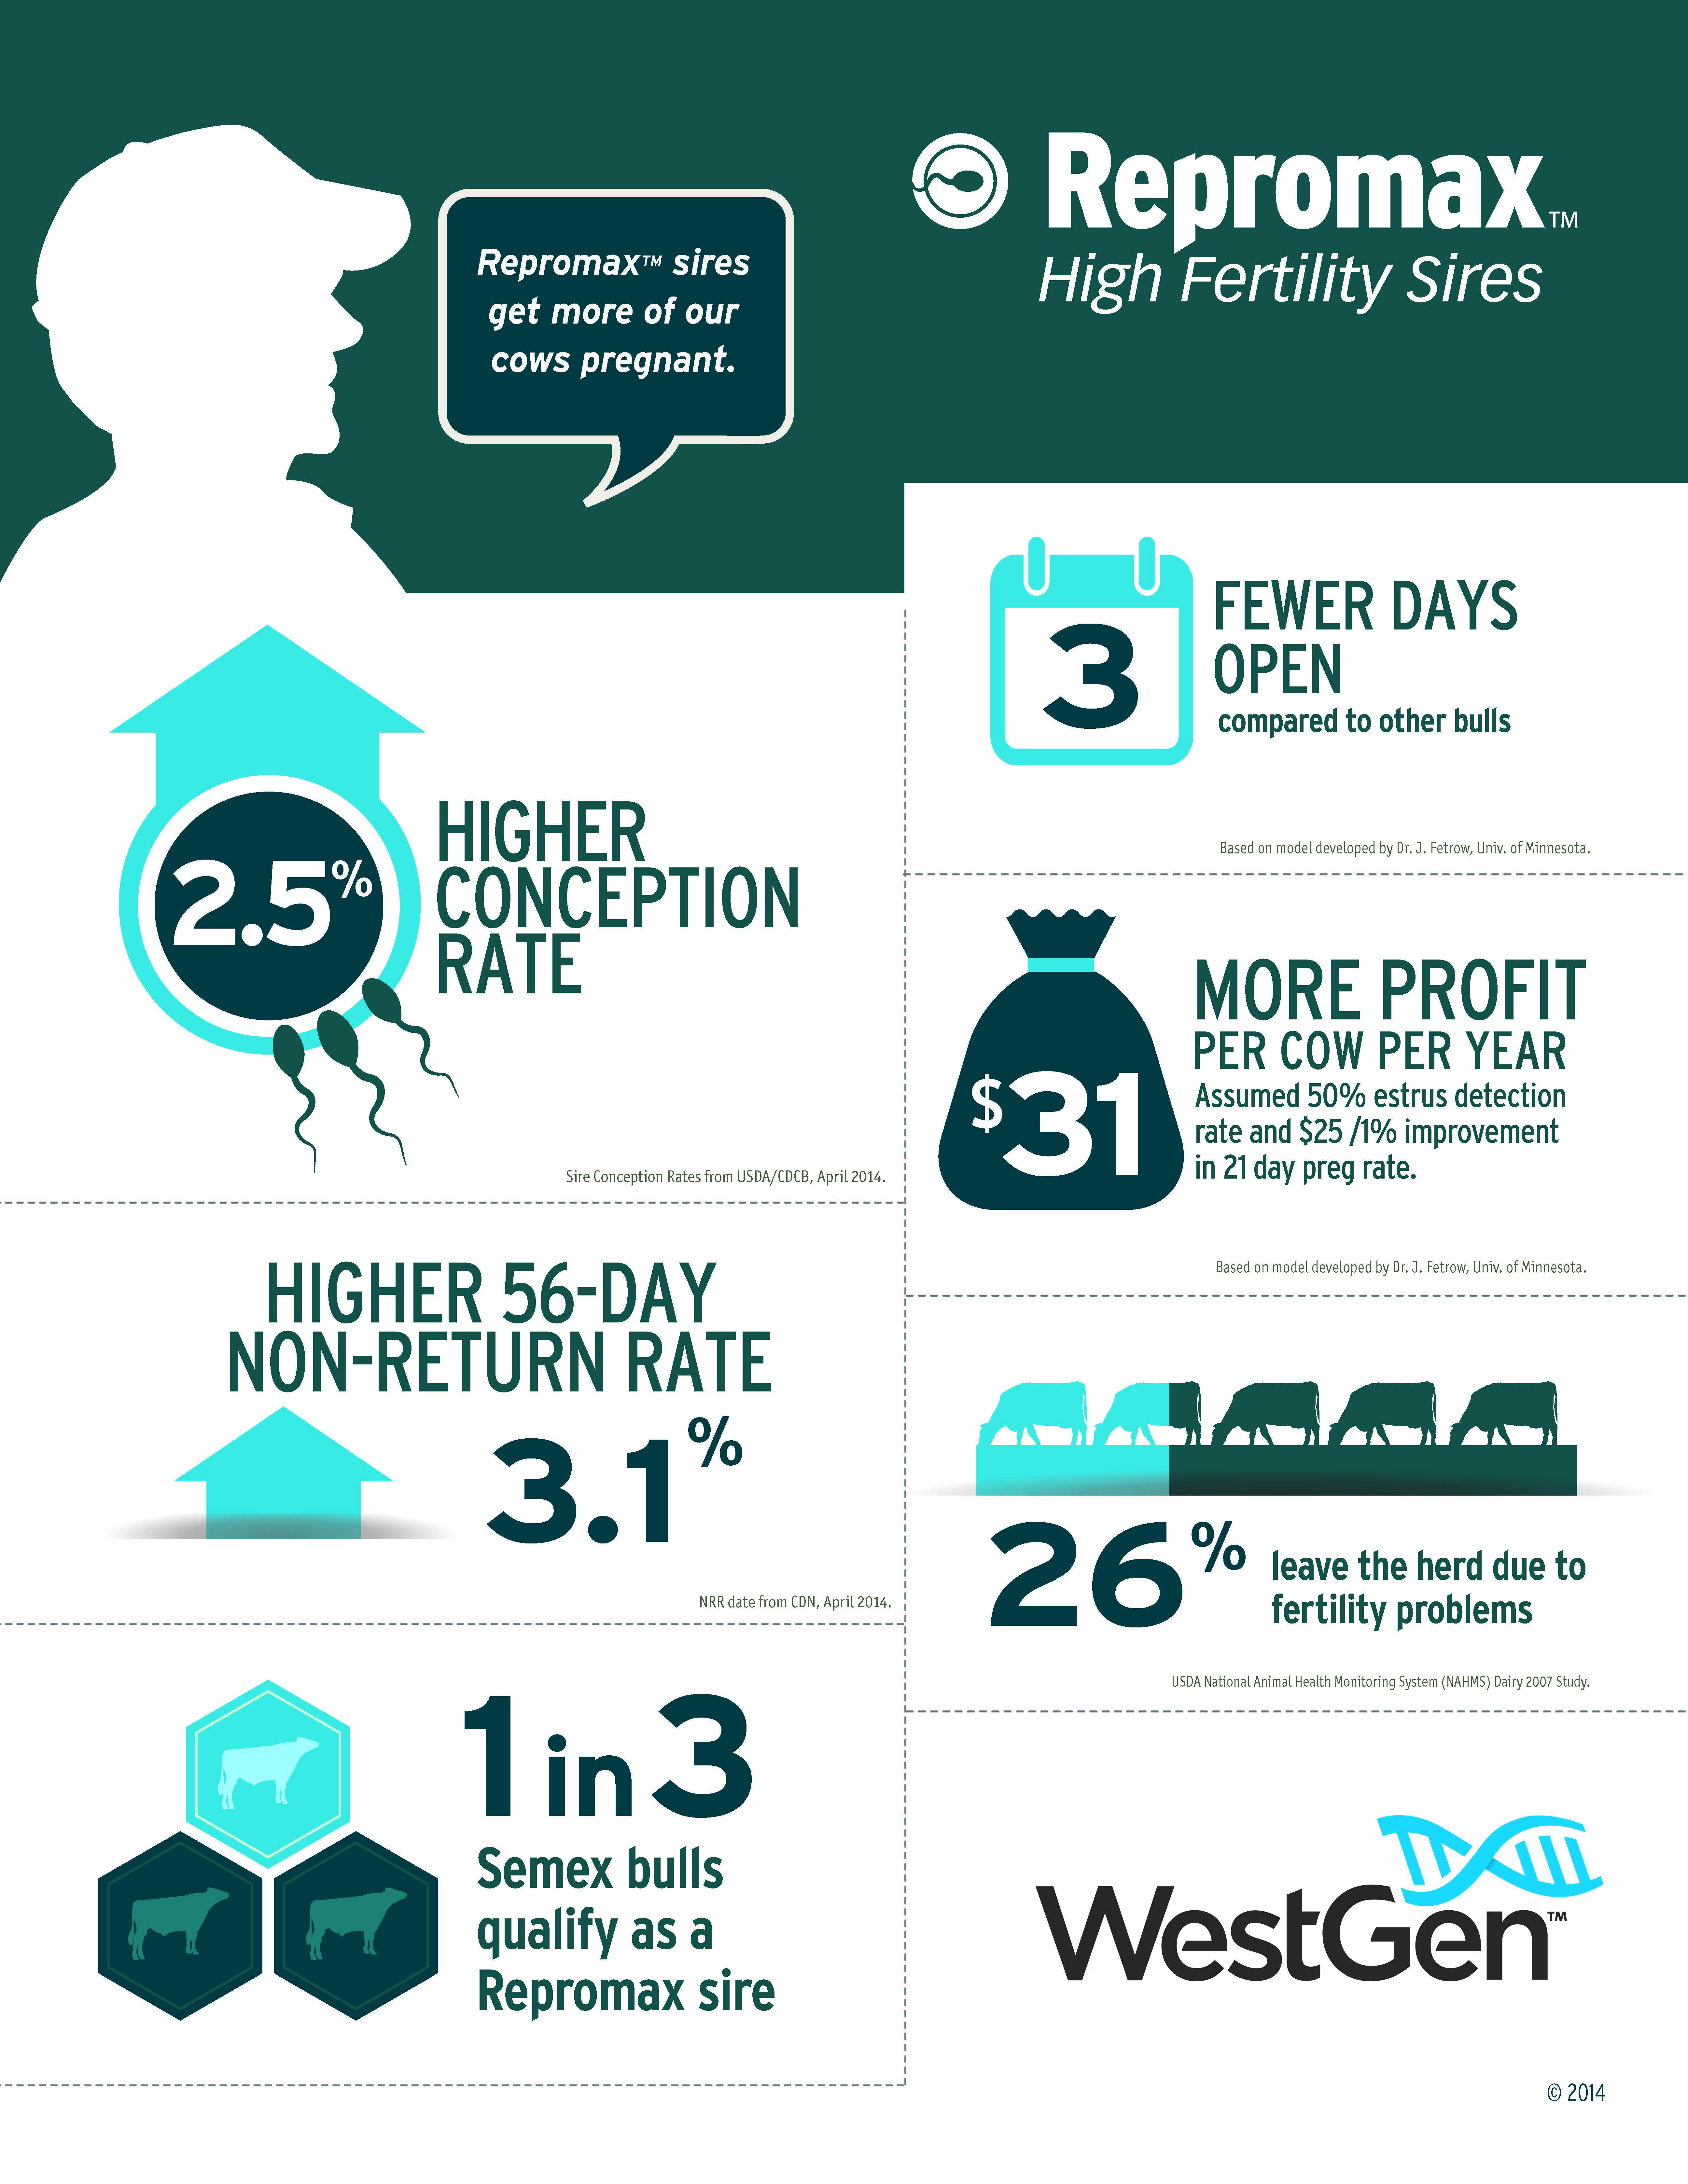 Repromax infographic